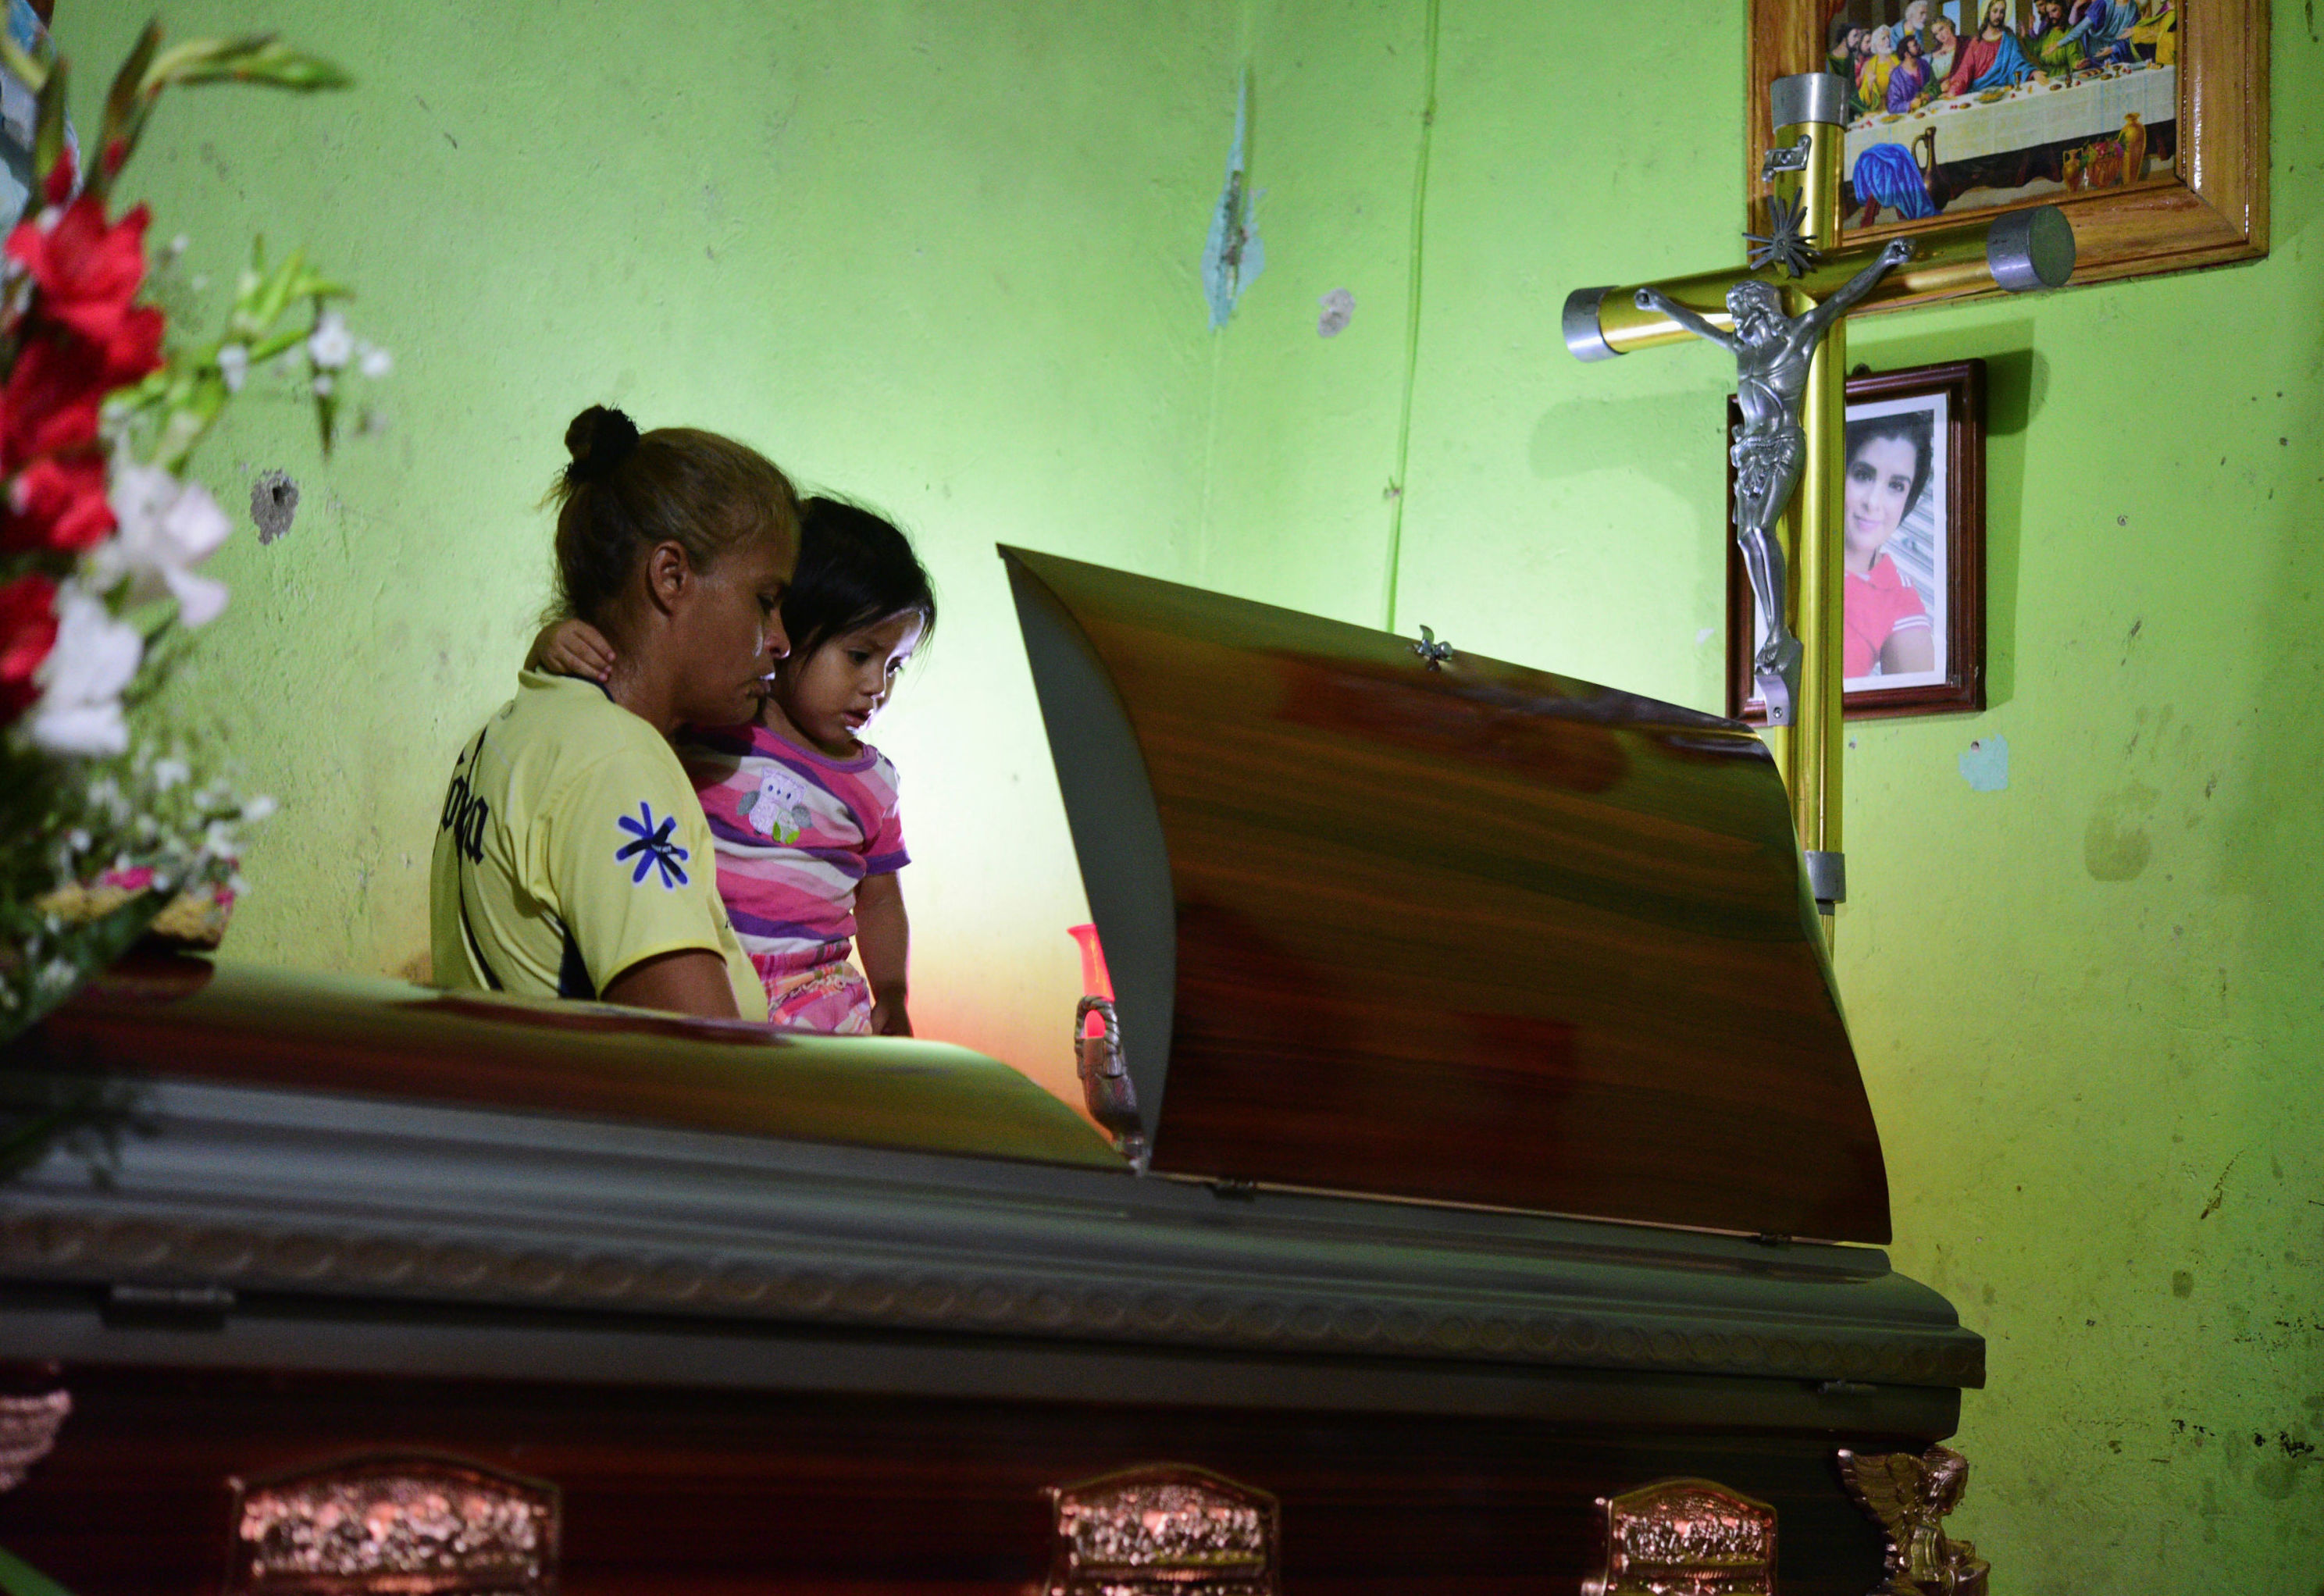 La madre y la hija de Xóchitl Nayely Irineo Gómez